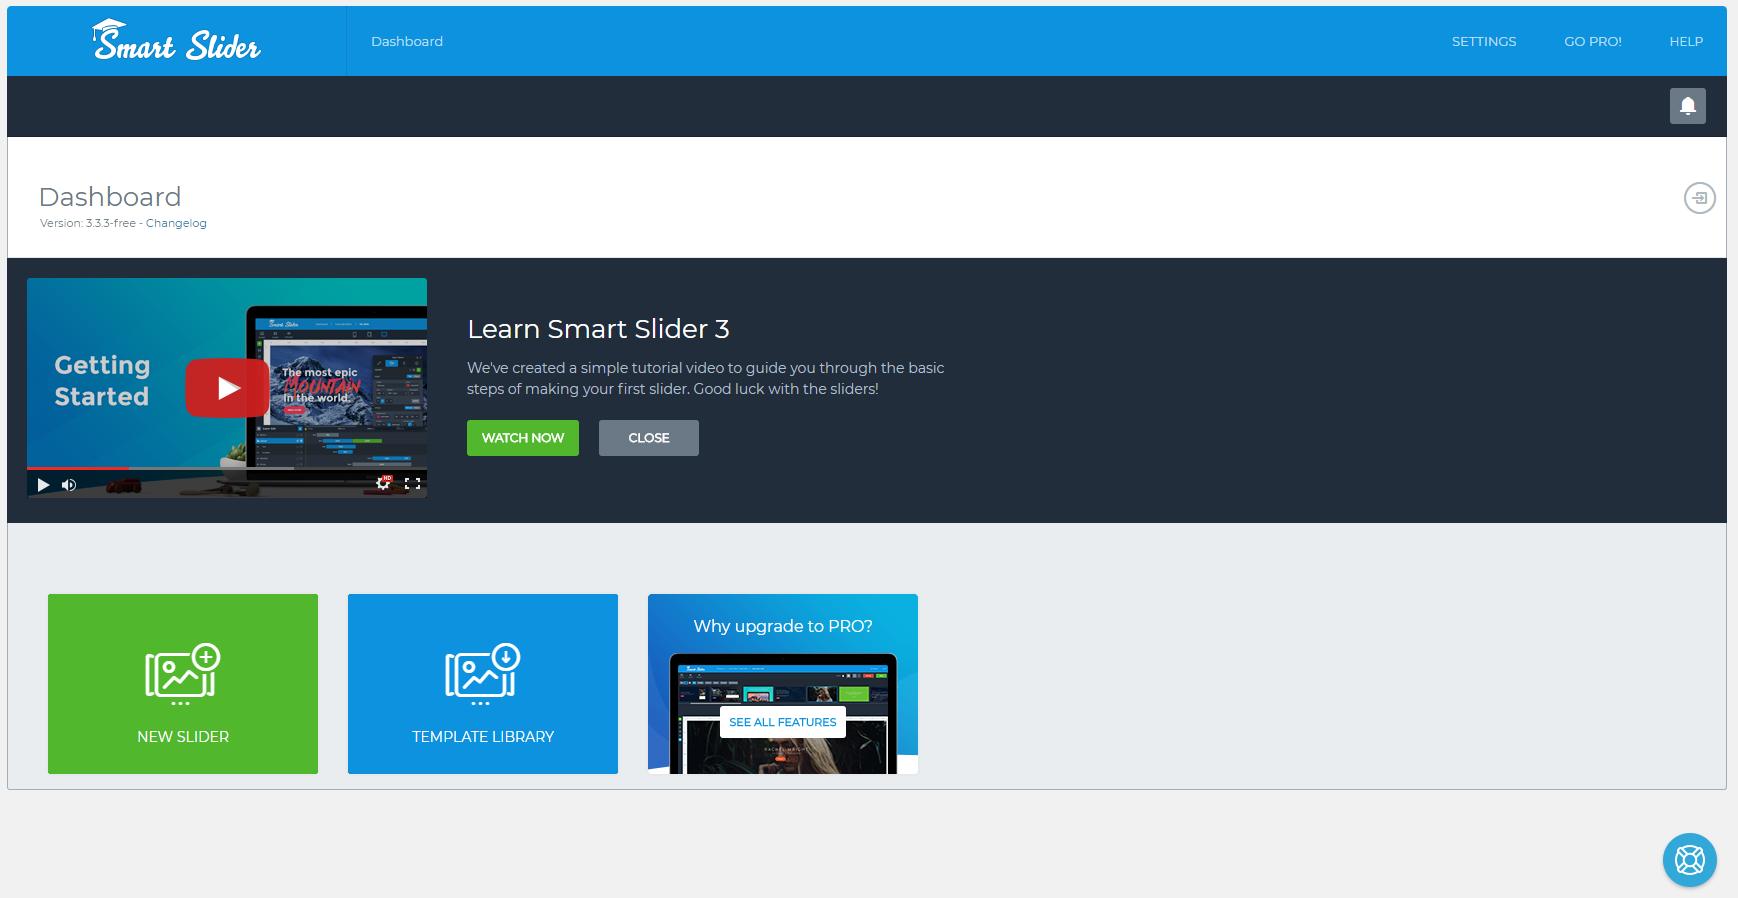 Smart Slider 3 Dashboard